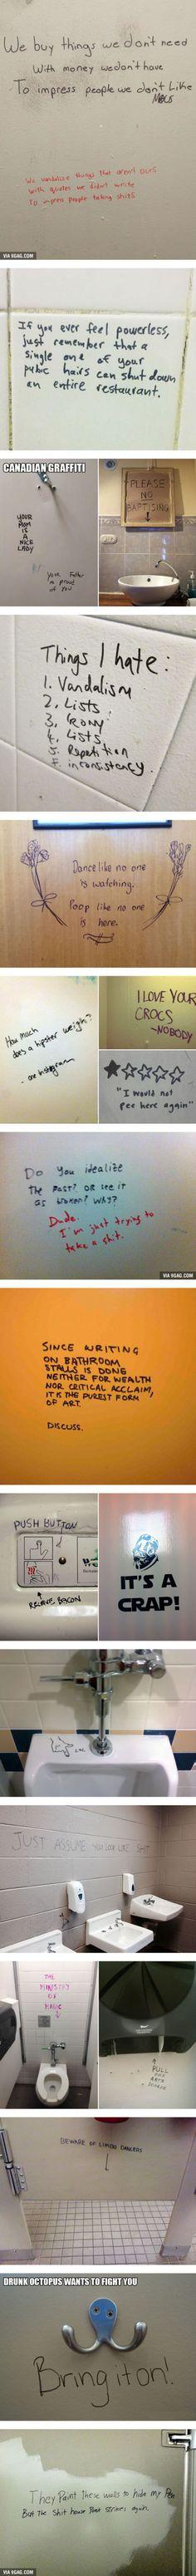 Brilliant Toilet Graffiti